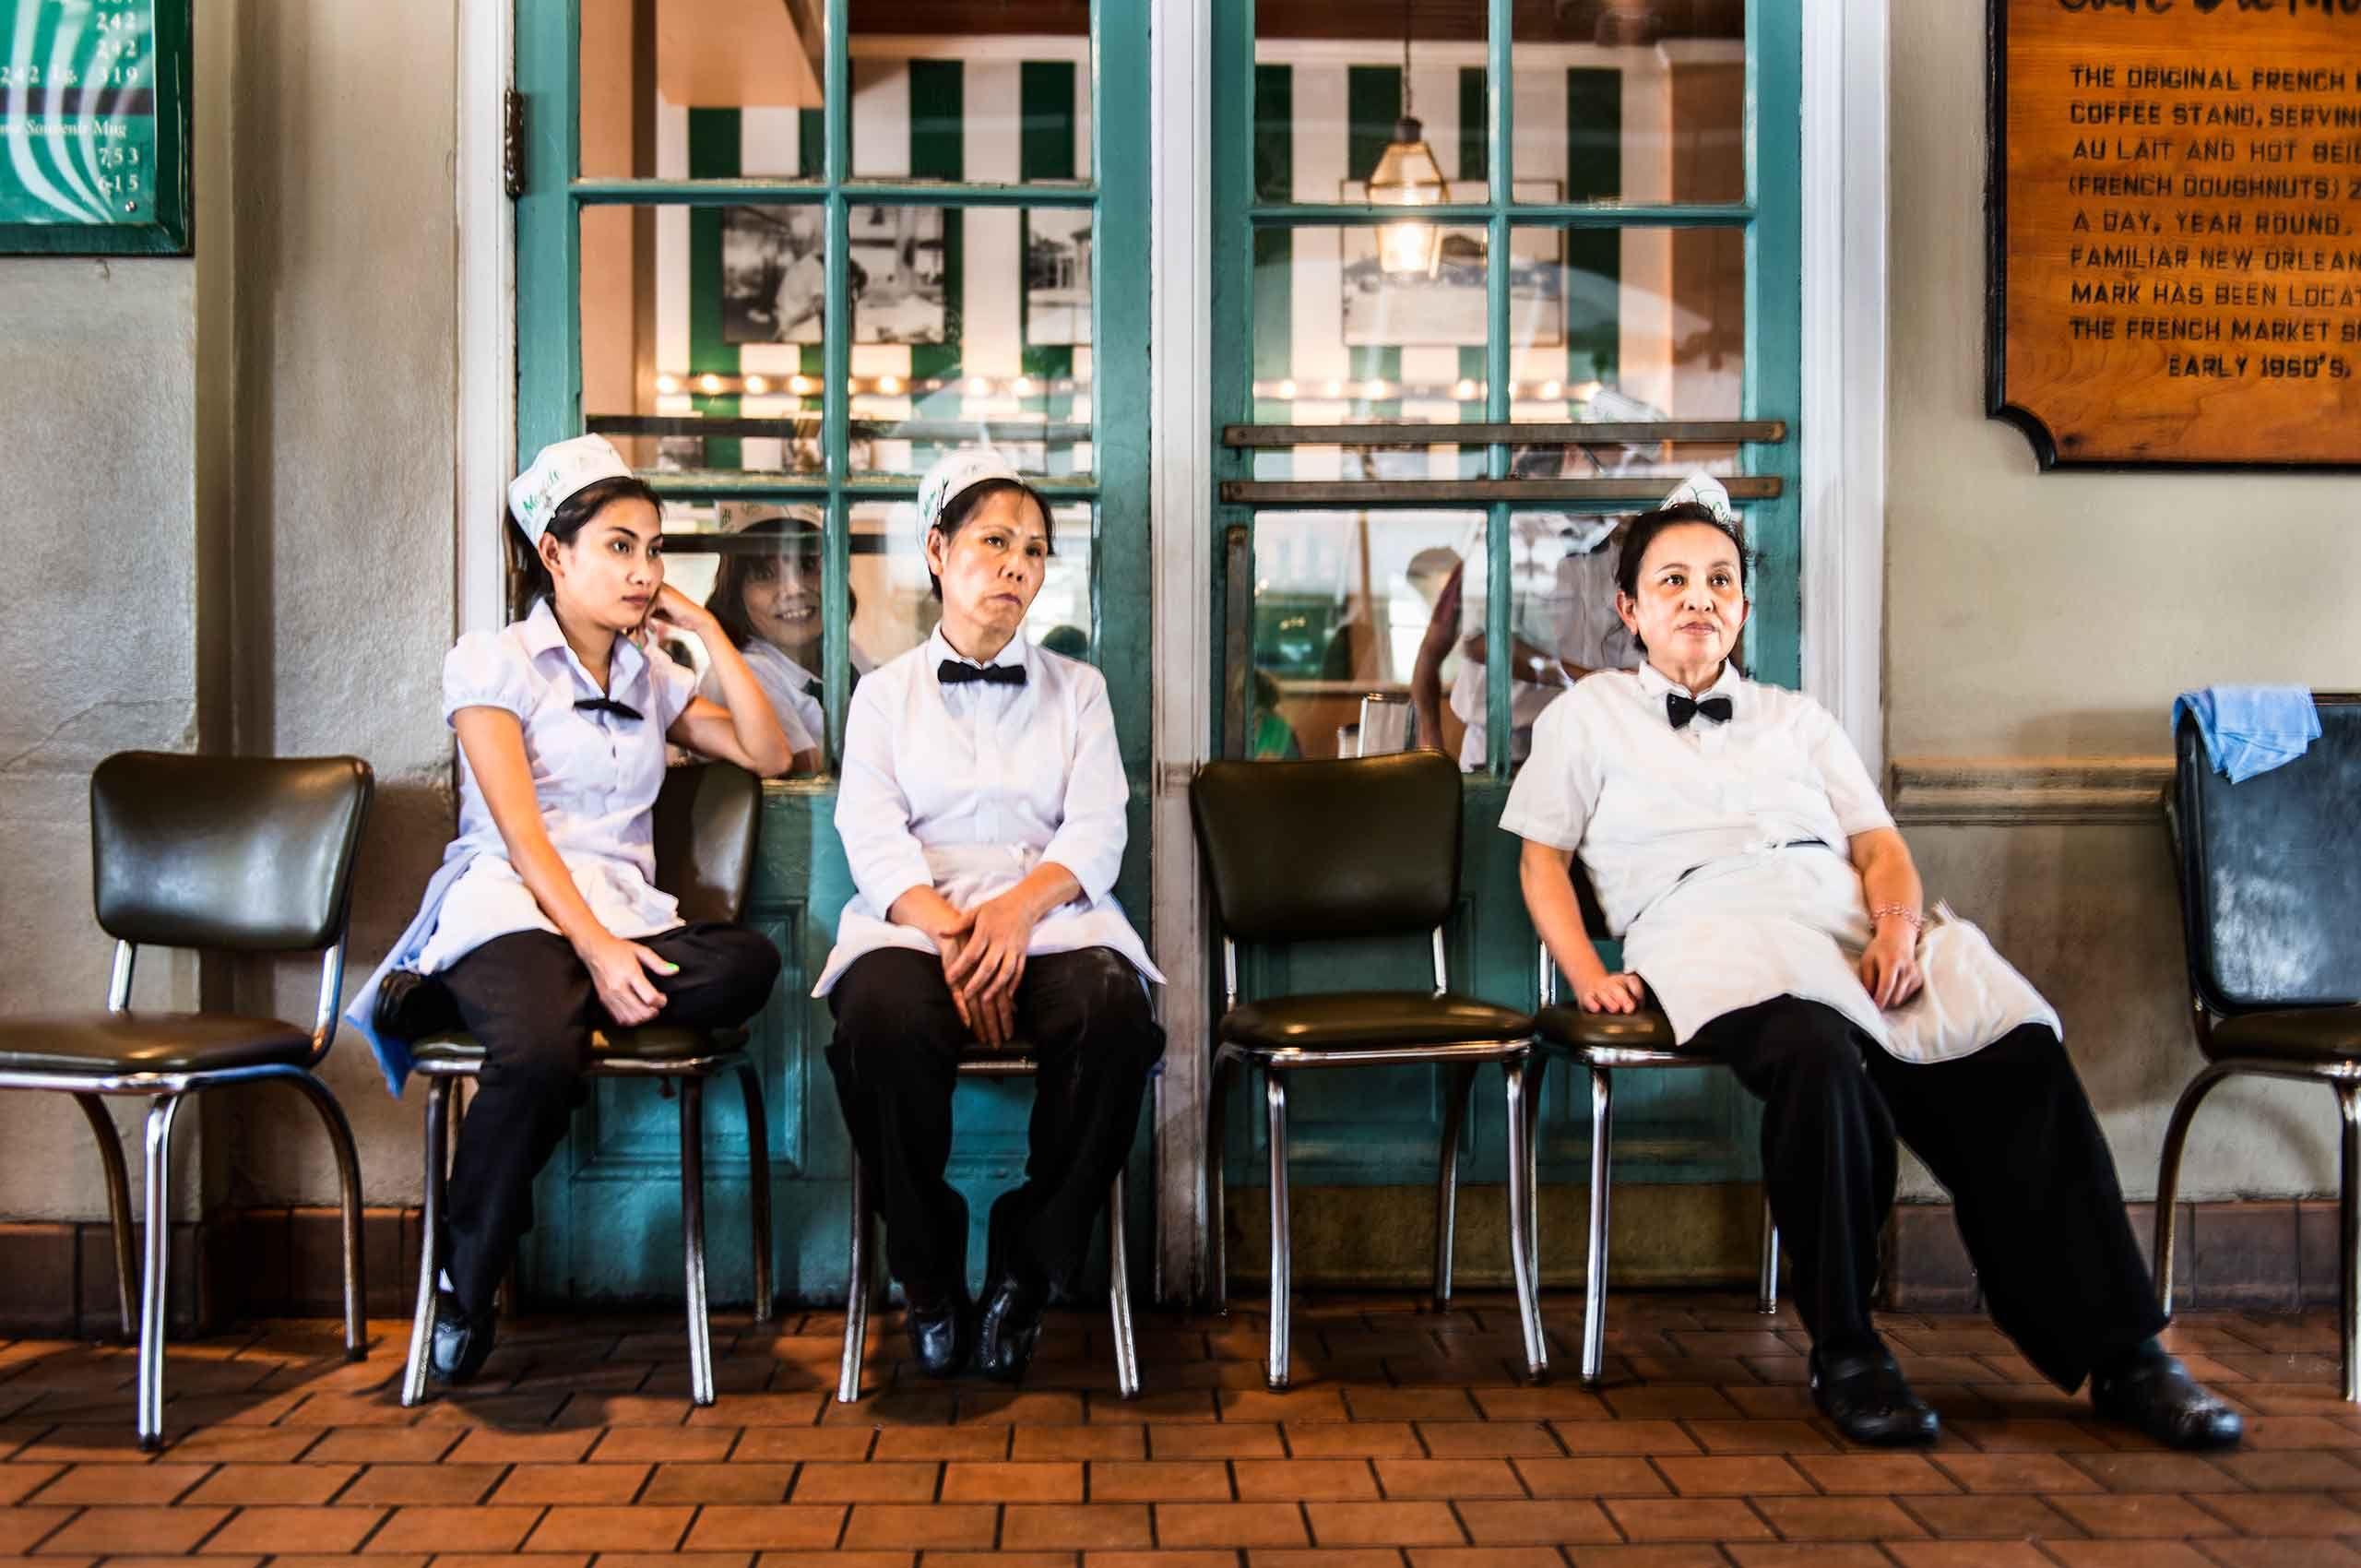 waitstaff-cafedumonde-neworleans-by-henrikolundphotography.jpg